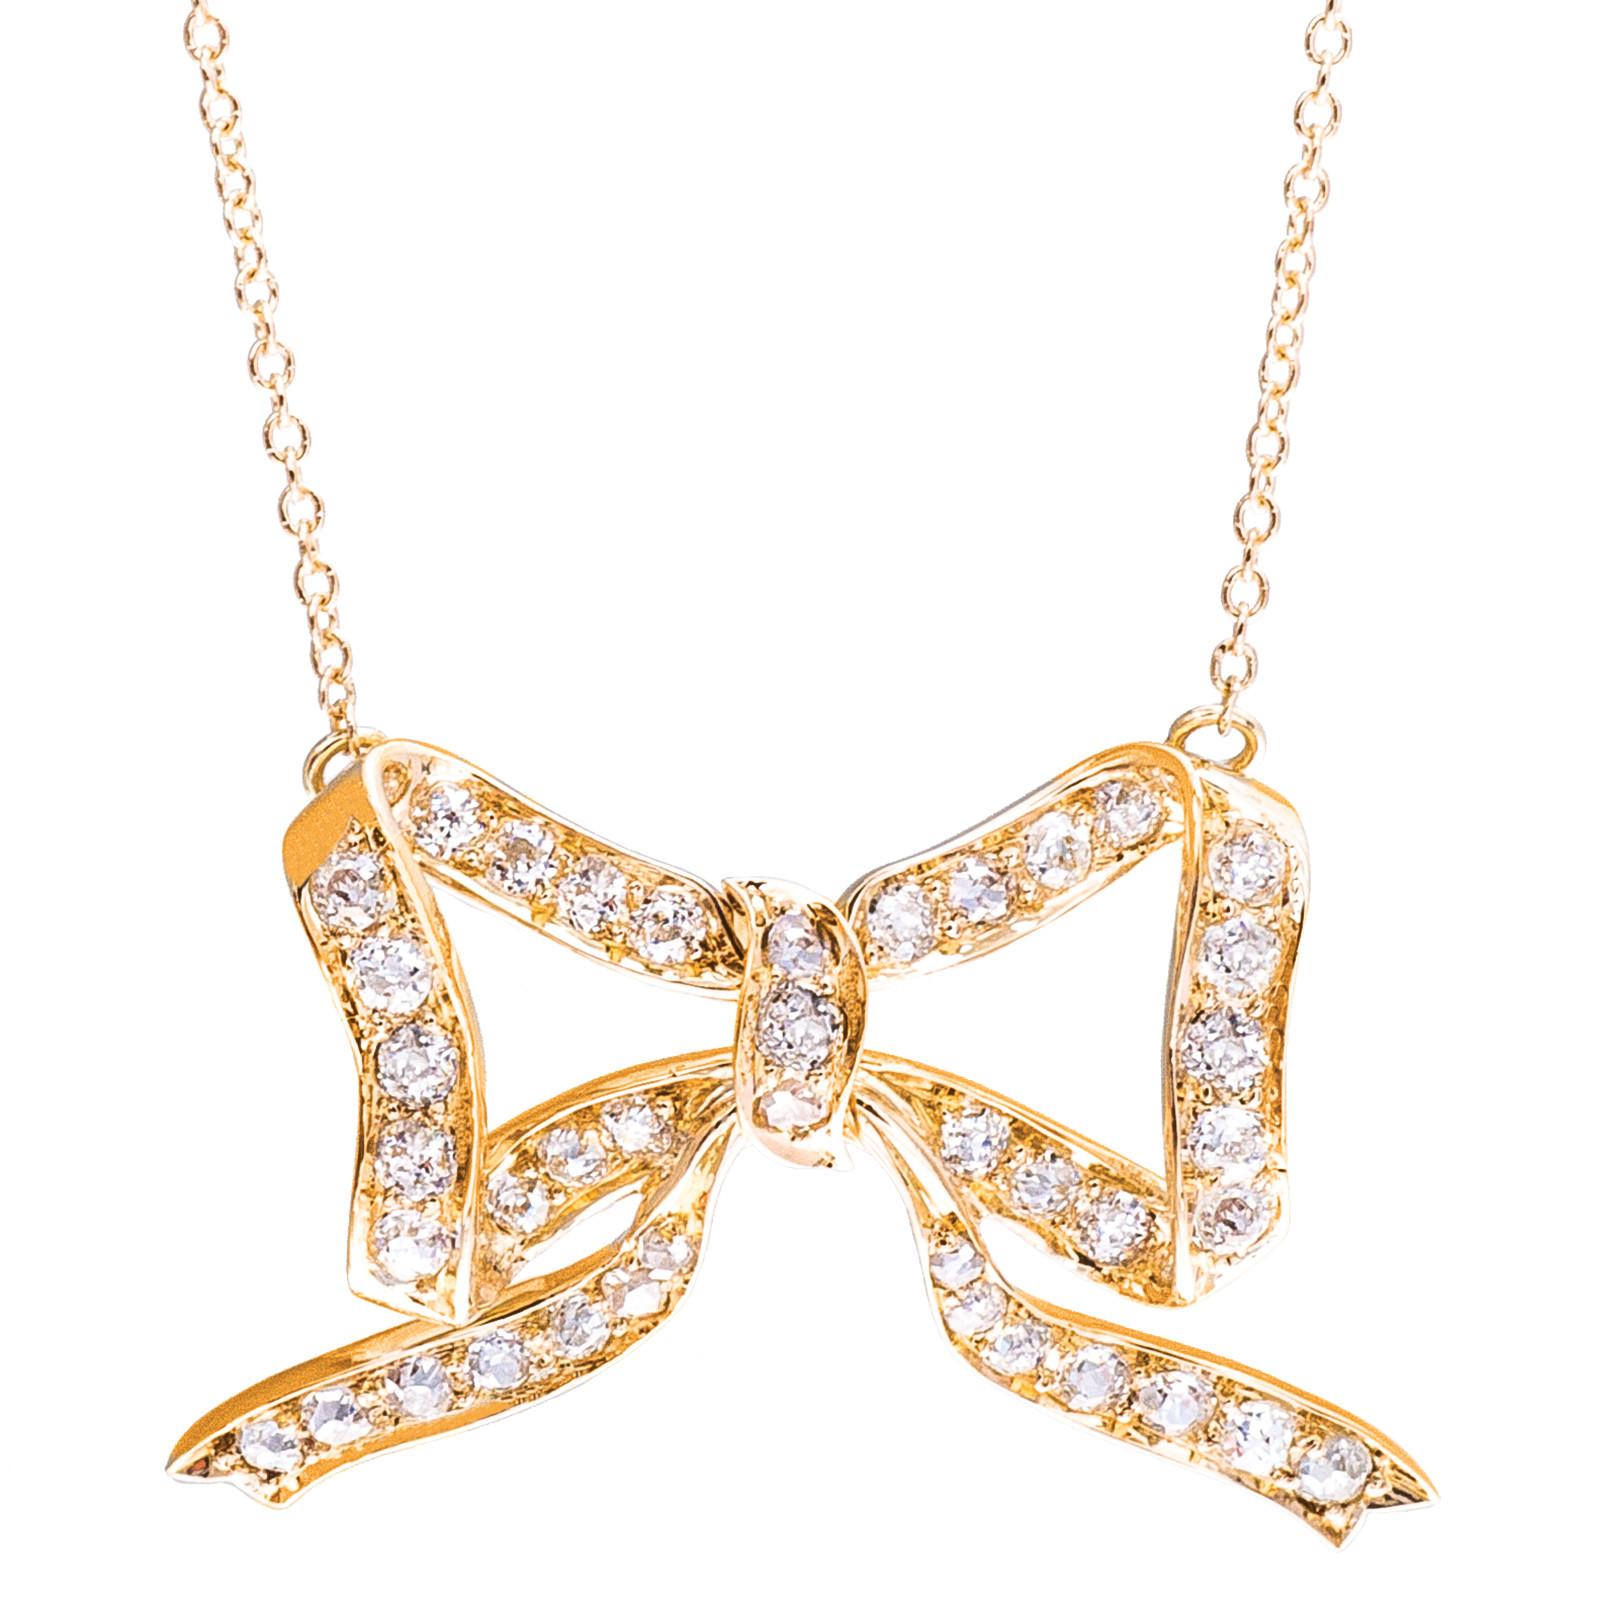 Vintage 0.80 CTW Diamond Bow Necklace